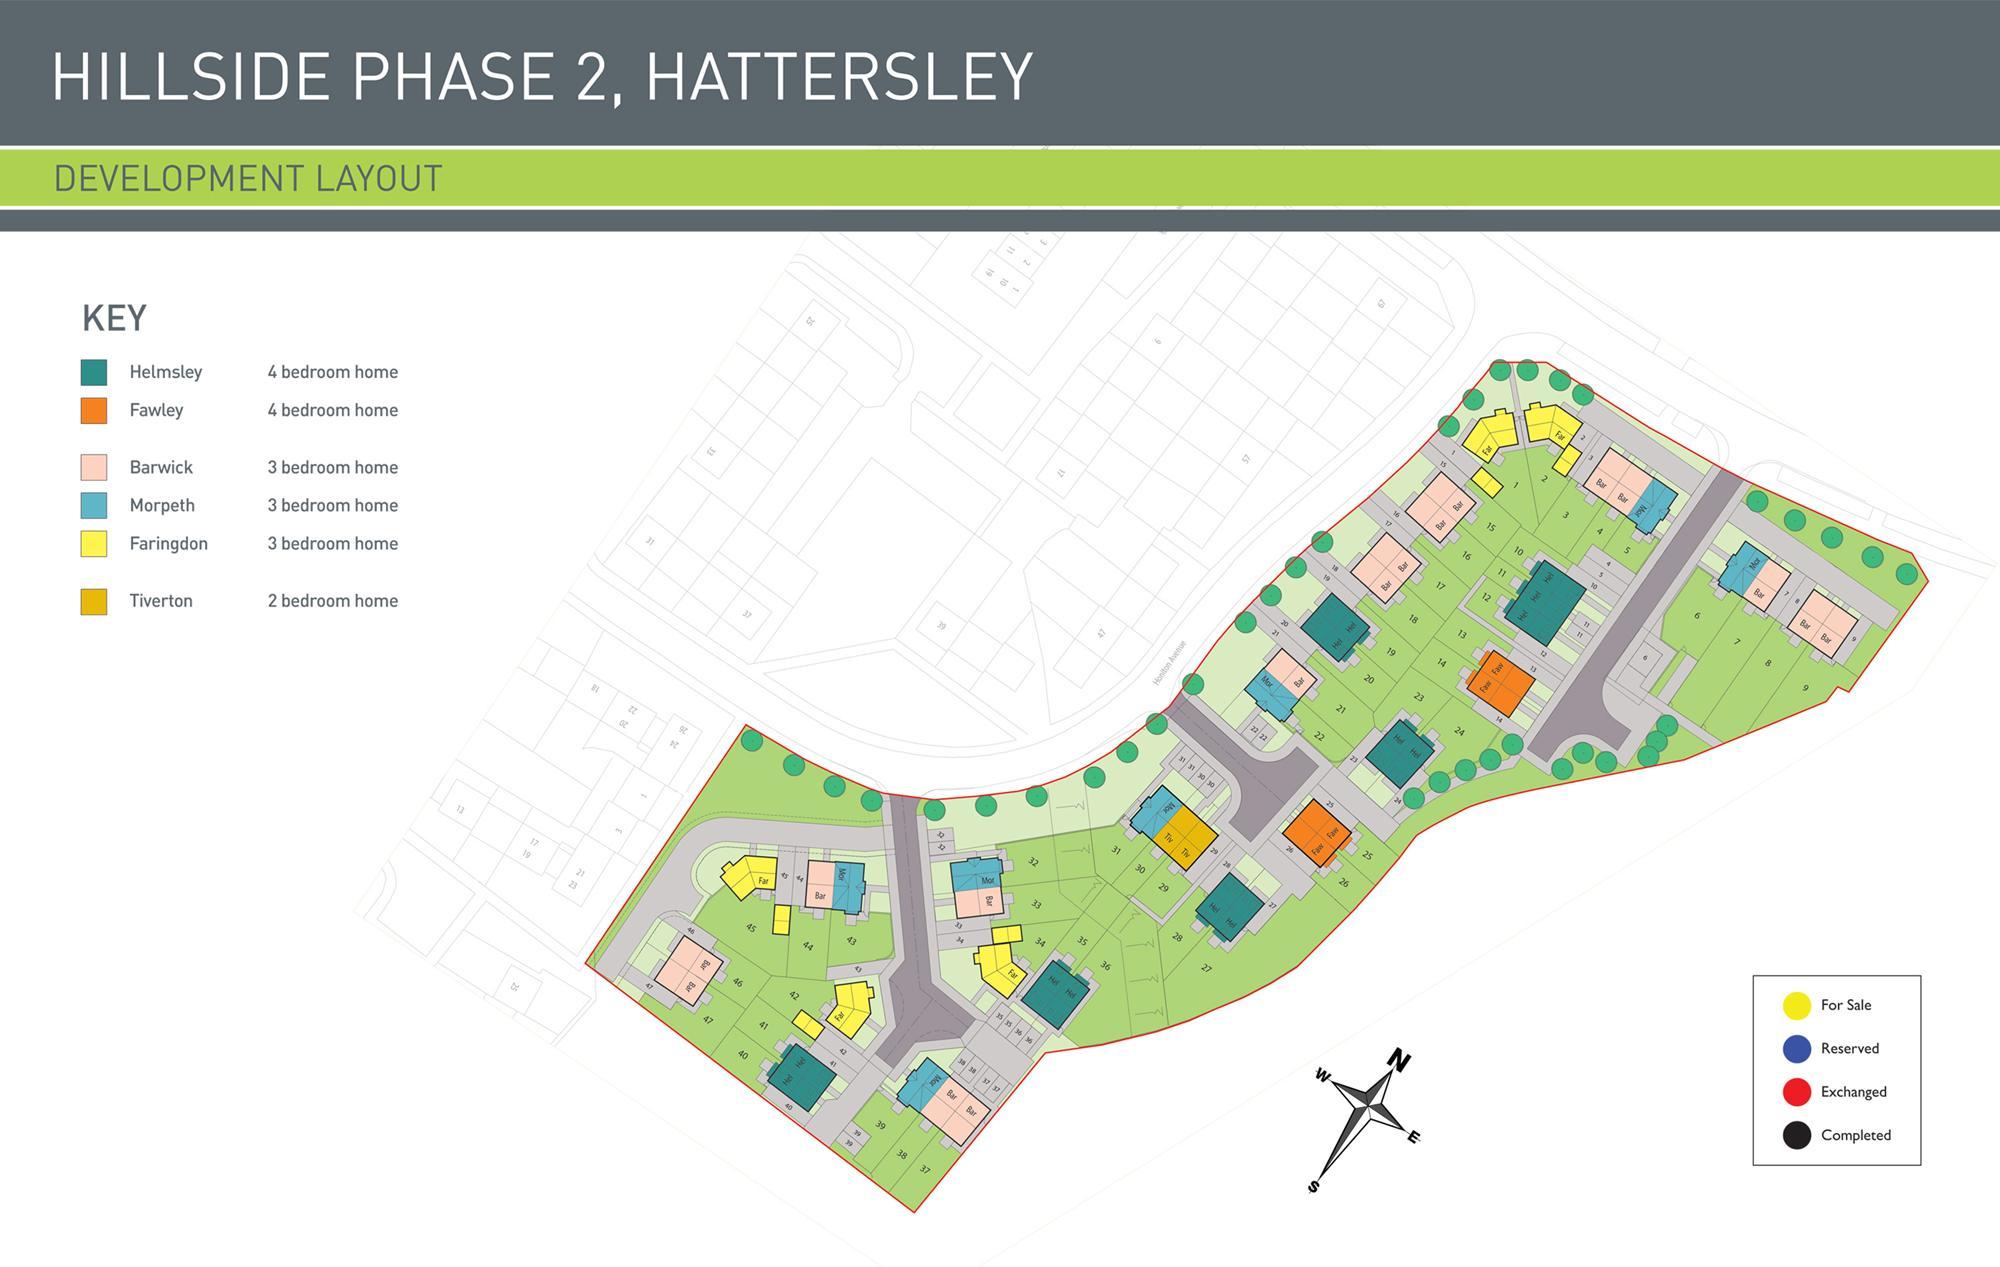 Hillside Phase 2 Site Plan